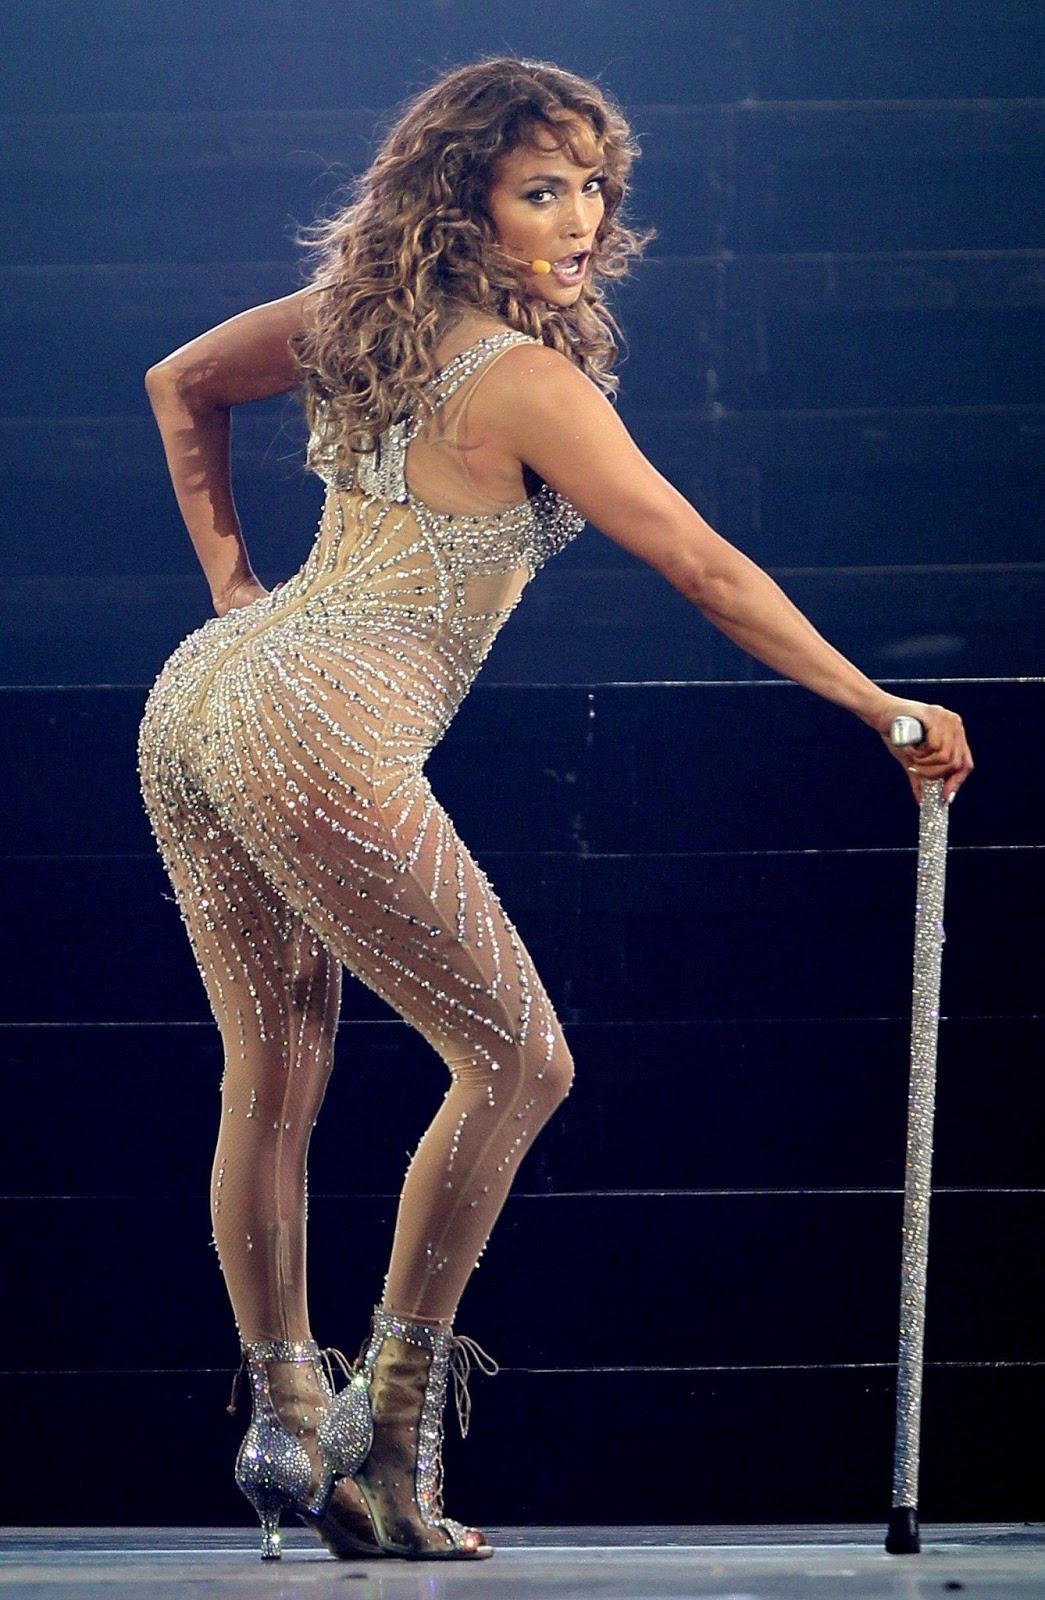 Hot Actress, Models, Heroine and Celebrities Hot Photos, Pics, Wallpapers.: Big Butts Jennifer Lopez